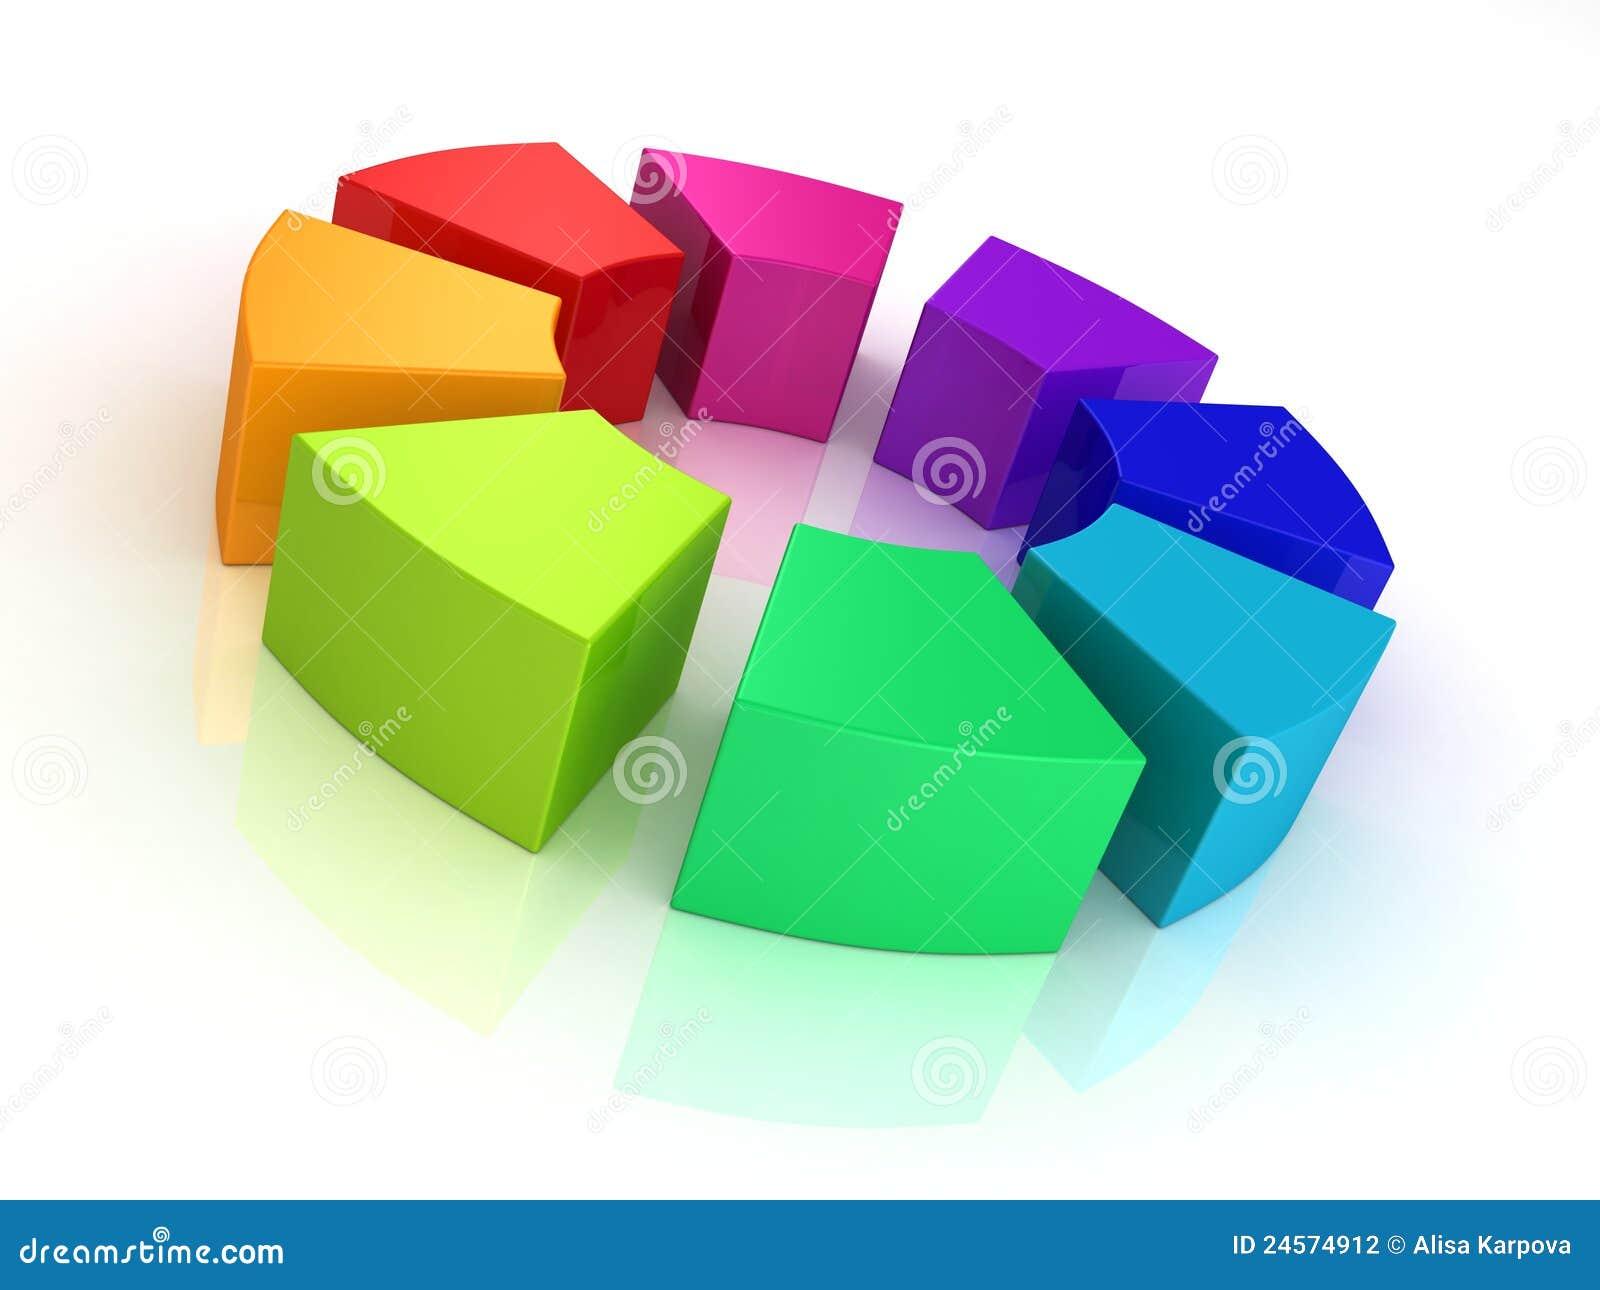 color wheel bar diagram on white background stock illustration rh dreamstime com